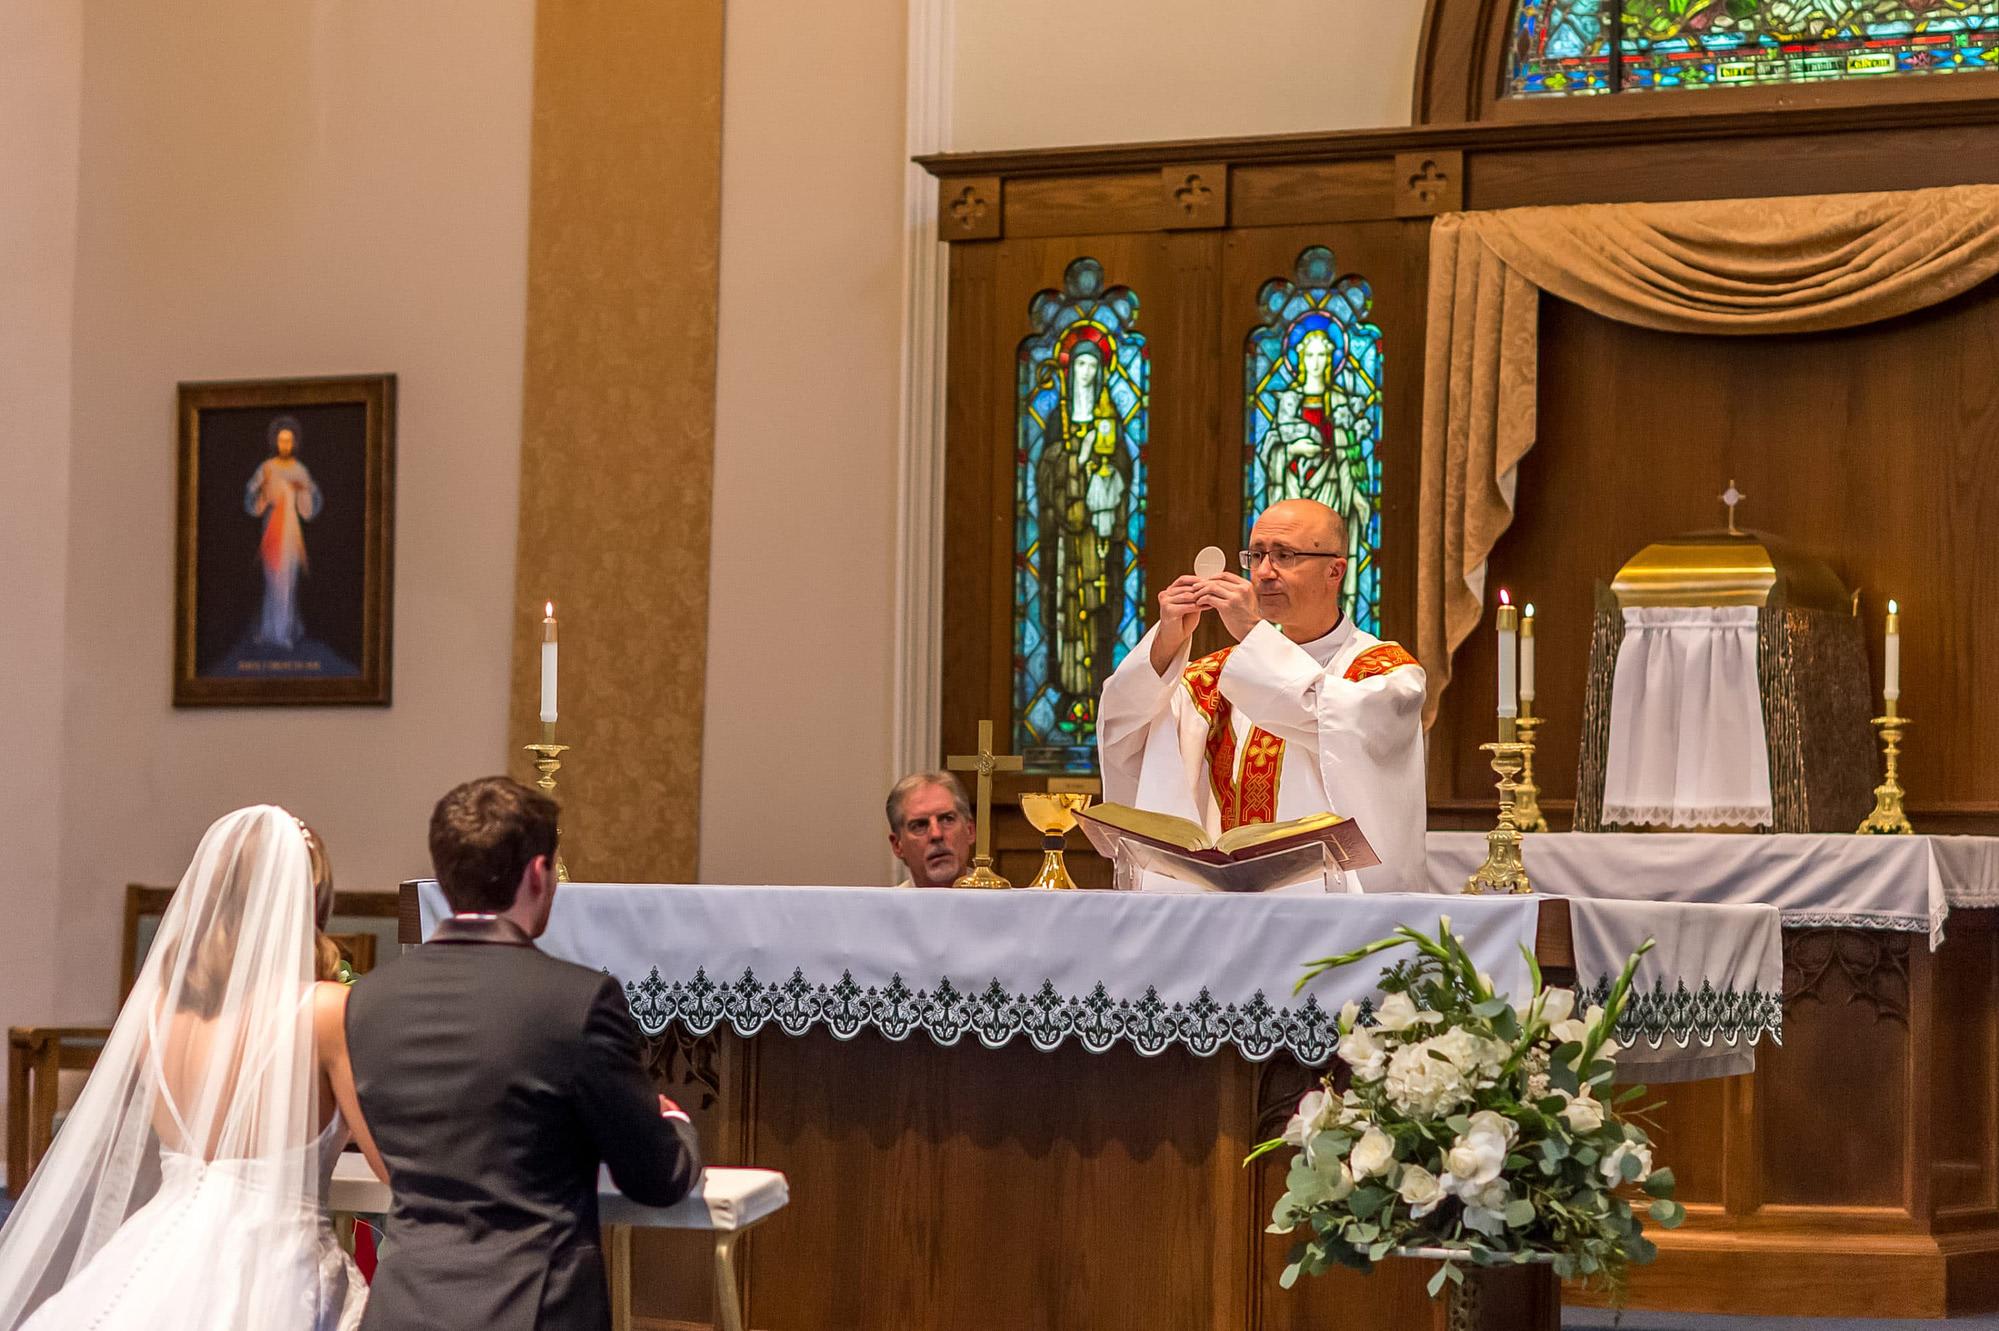 Nuptial wedding Mass during Blessed Sacrament Denver wedding ceremony.